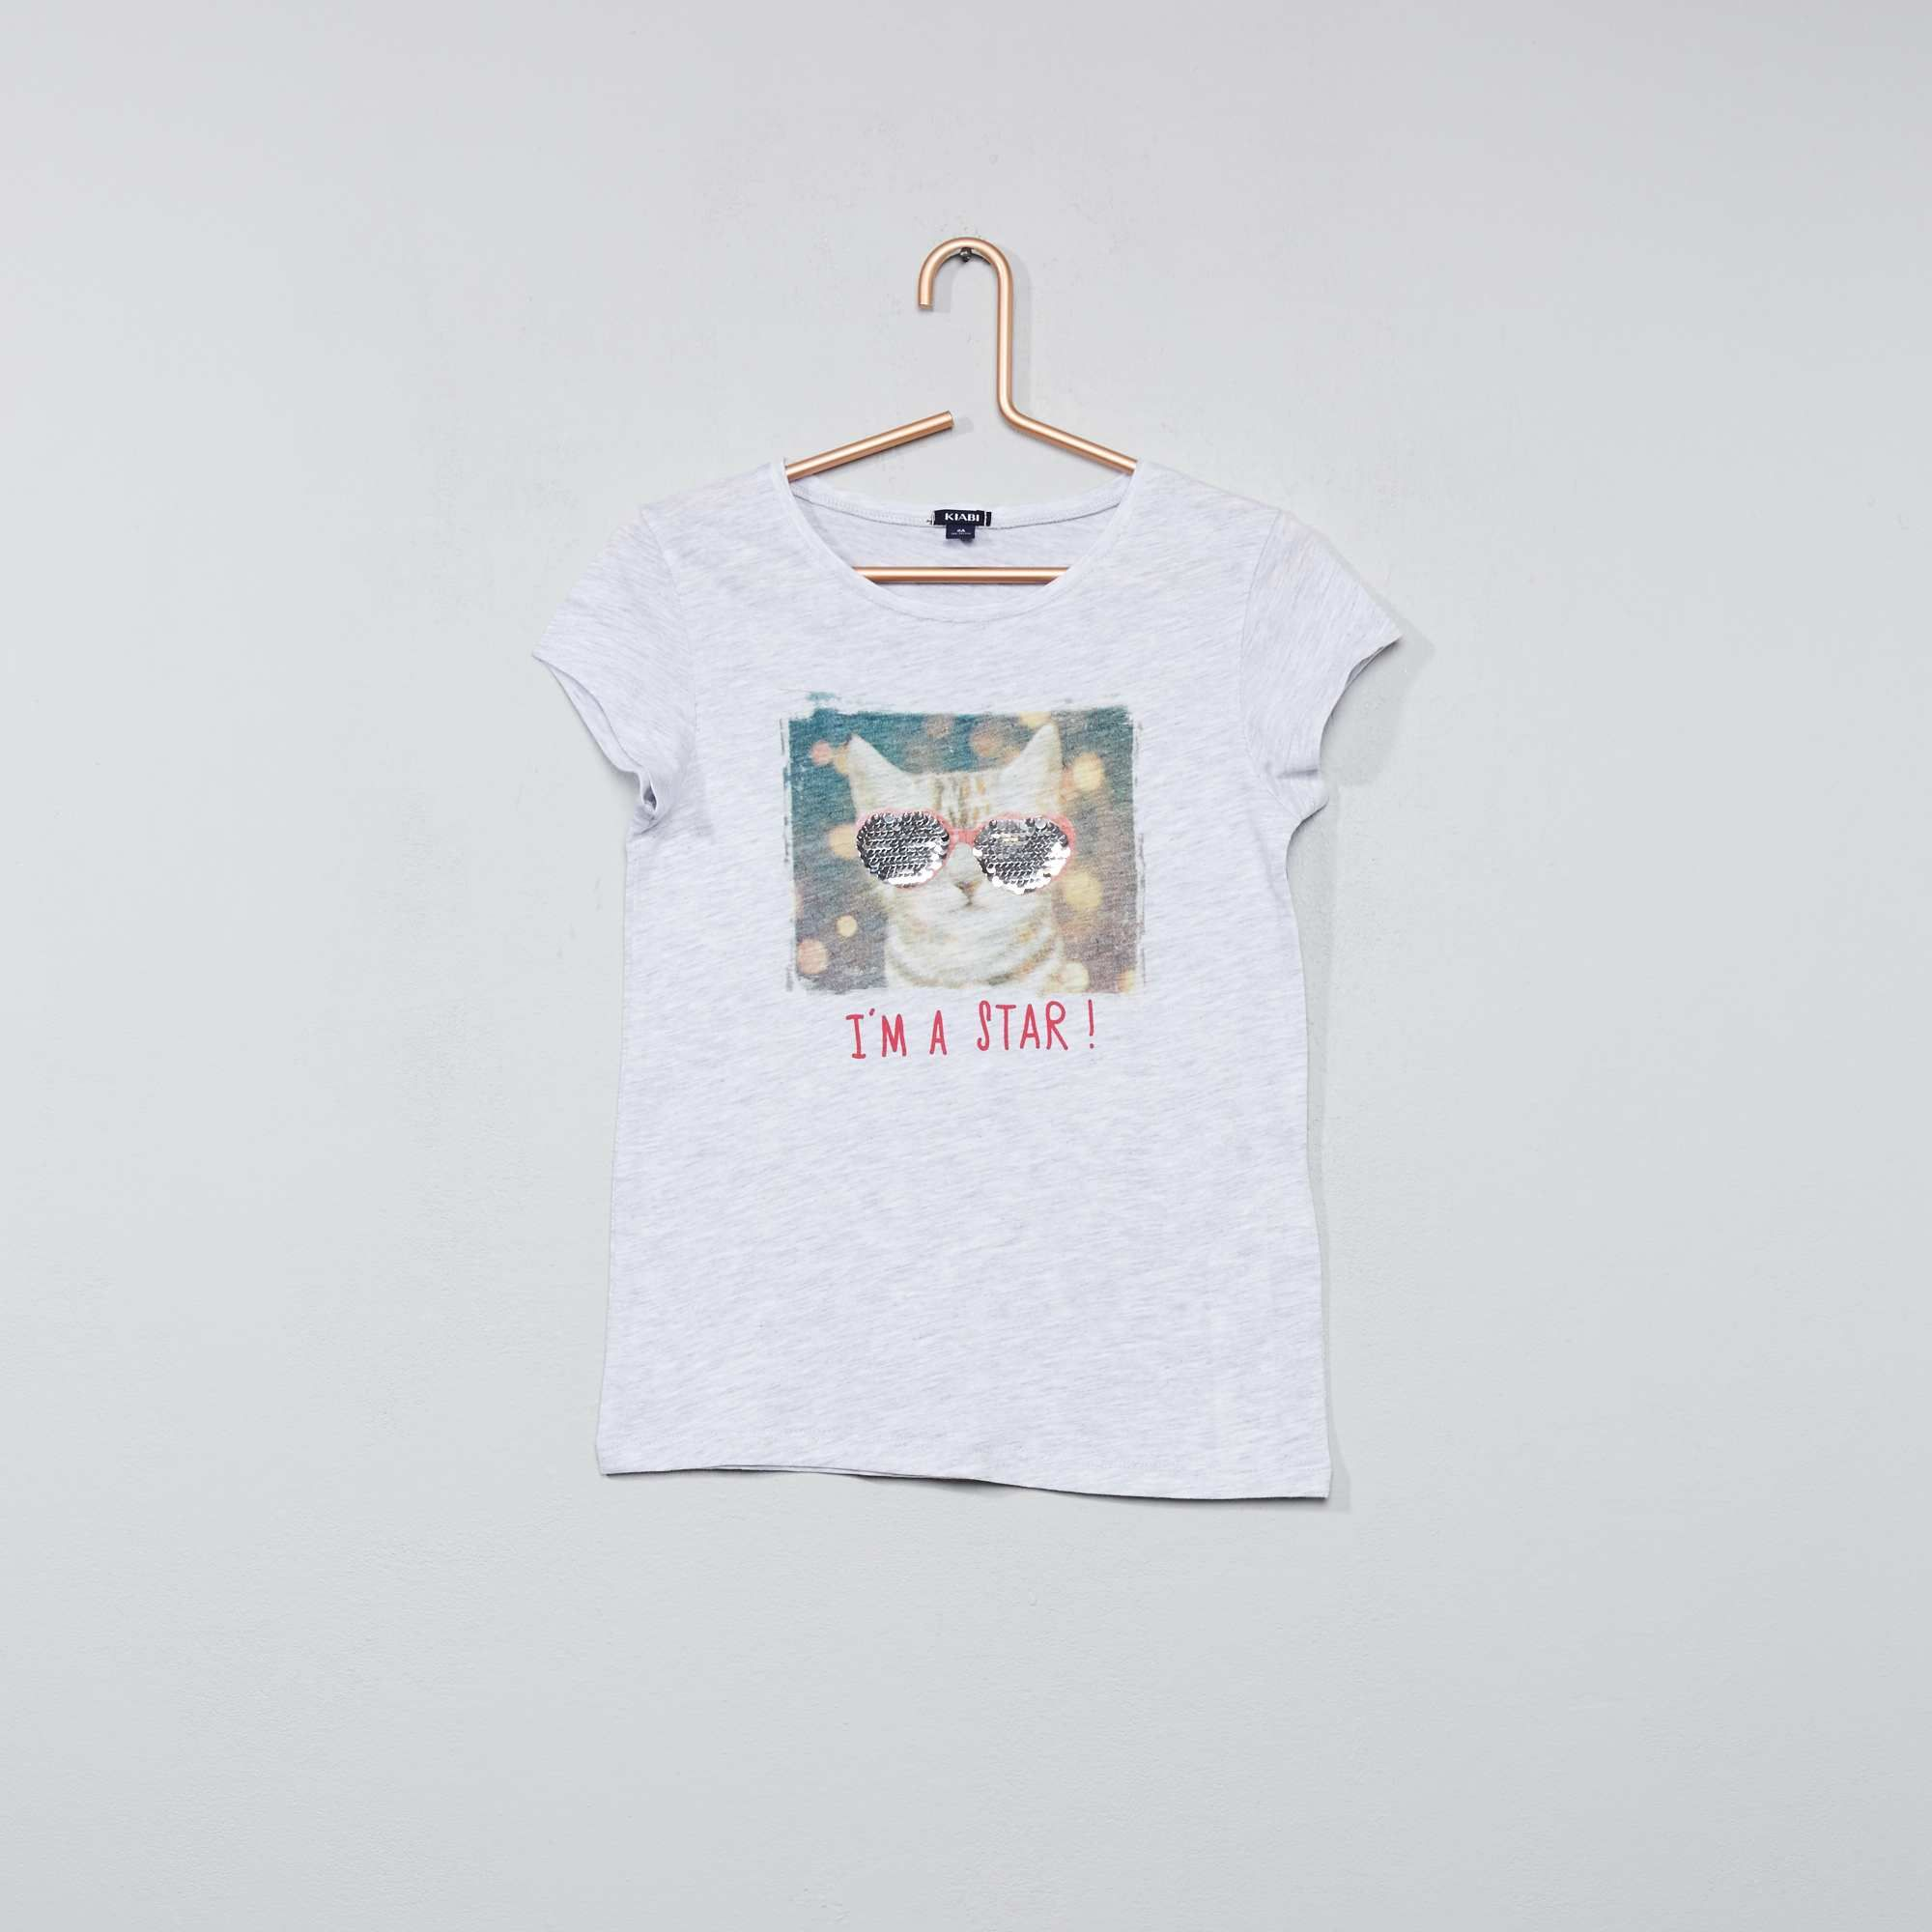 7ffe05eb9 Camiseta con lentejuelas reversibles Chica - GRIS - Kiabi - 4